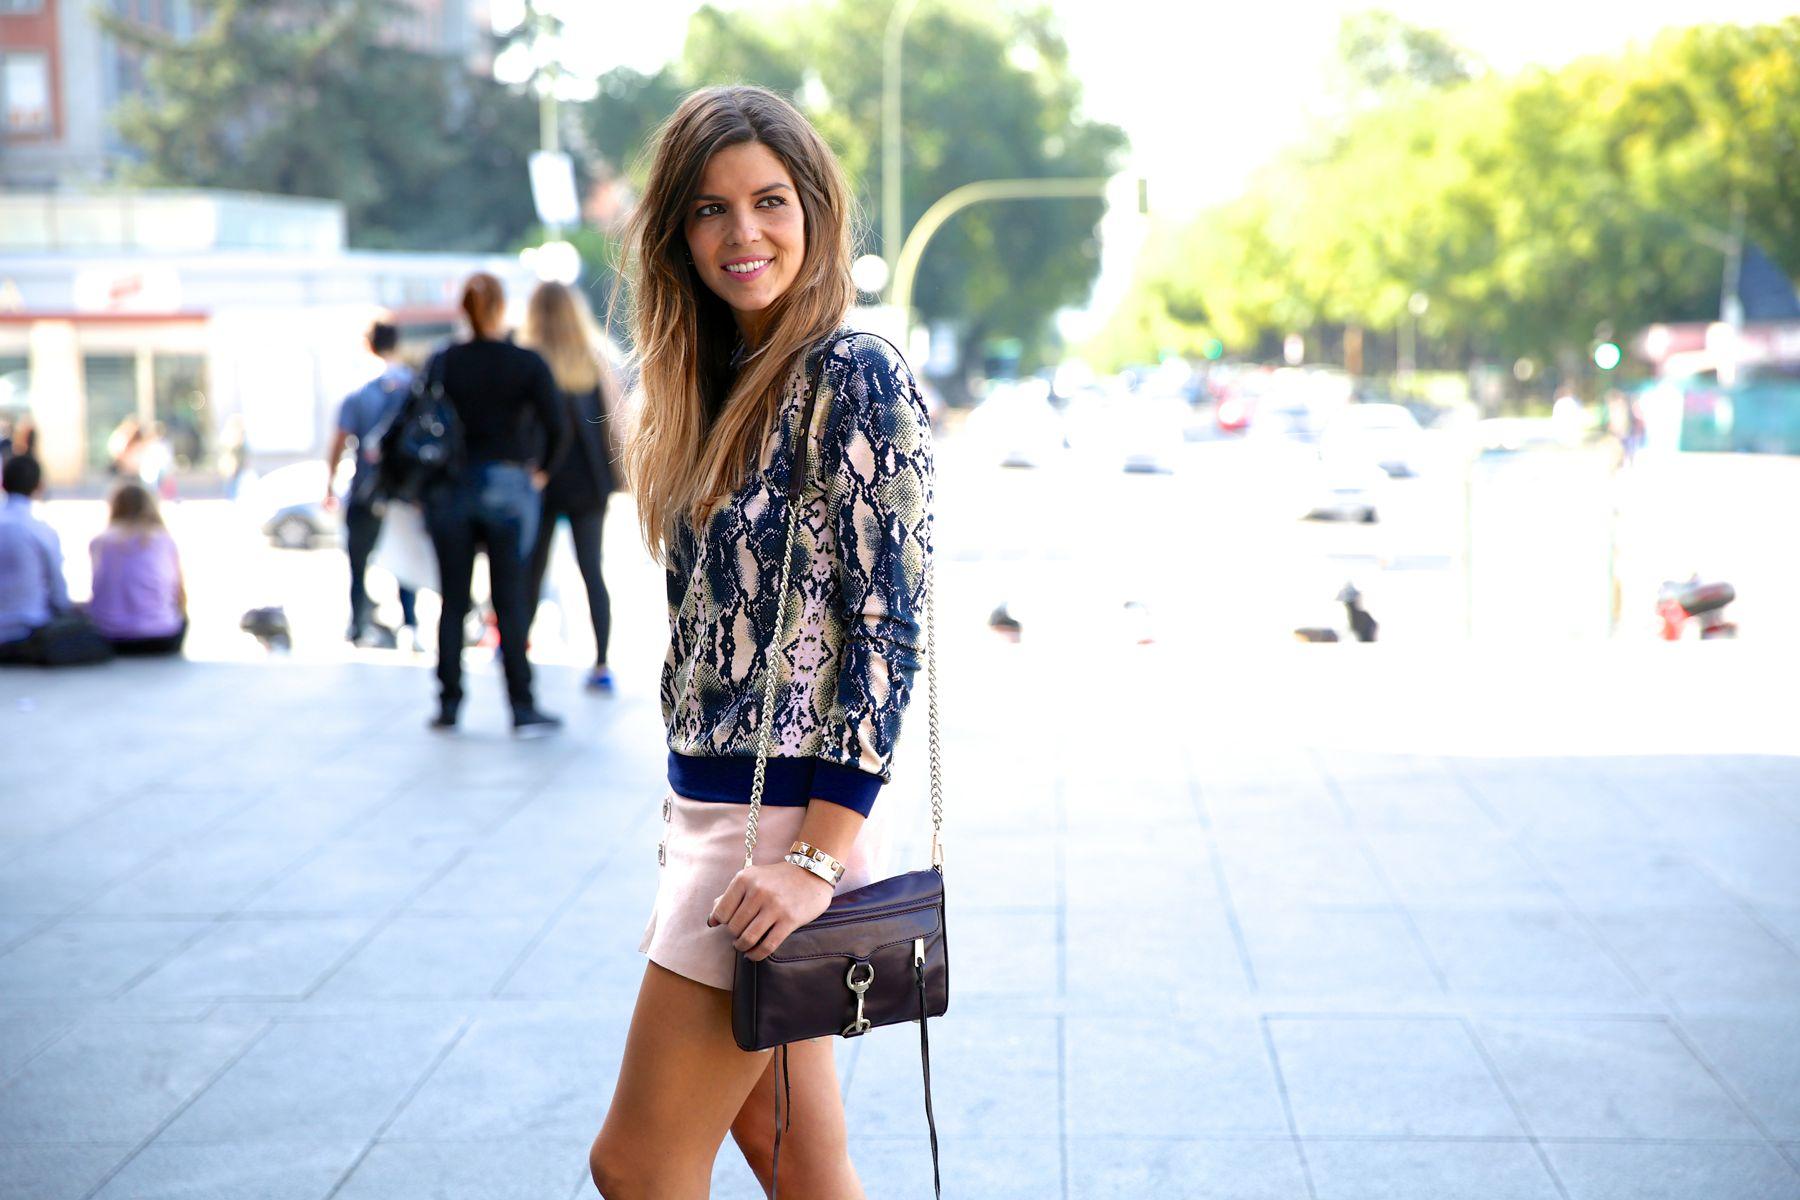 trendy_taste-look-outfit-street_style-ootd-blog-blogger-fashion_spain-moda_españa-girissima.com-sweatshirt-sudadera-estampado-crocodile-cocodrilo-botines-booties-pink_skirt-falda_rosa-4